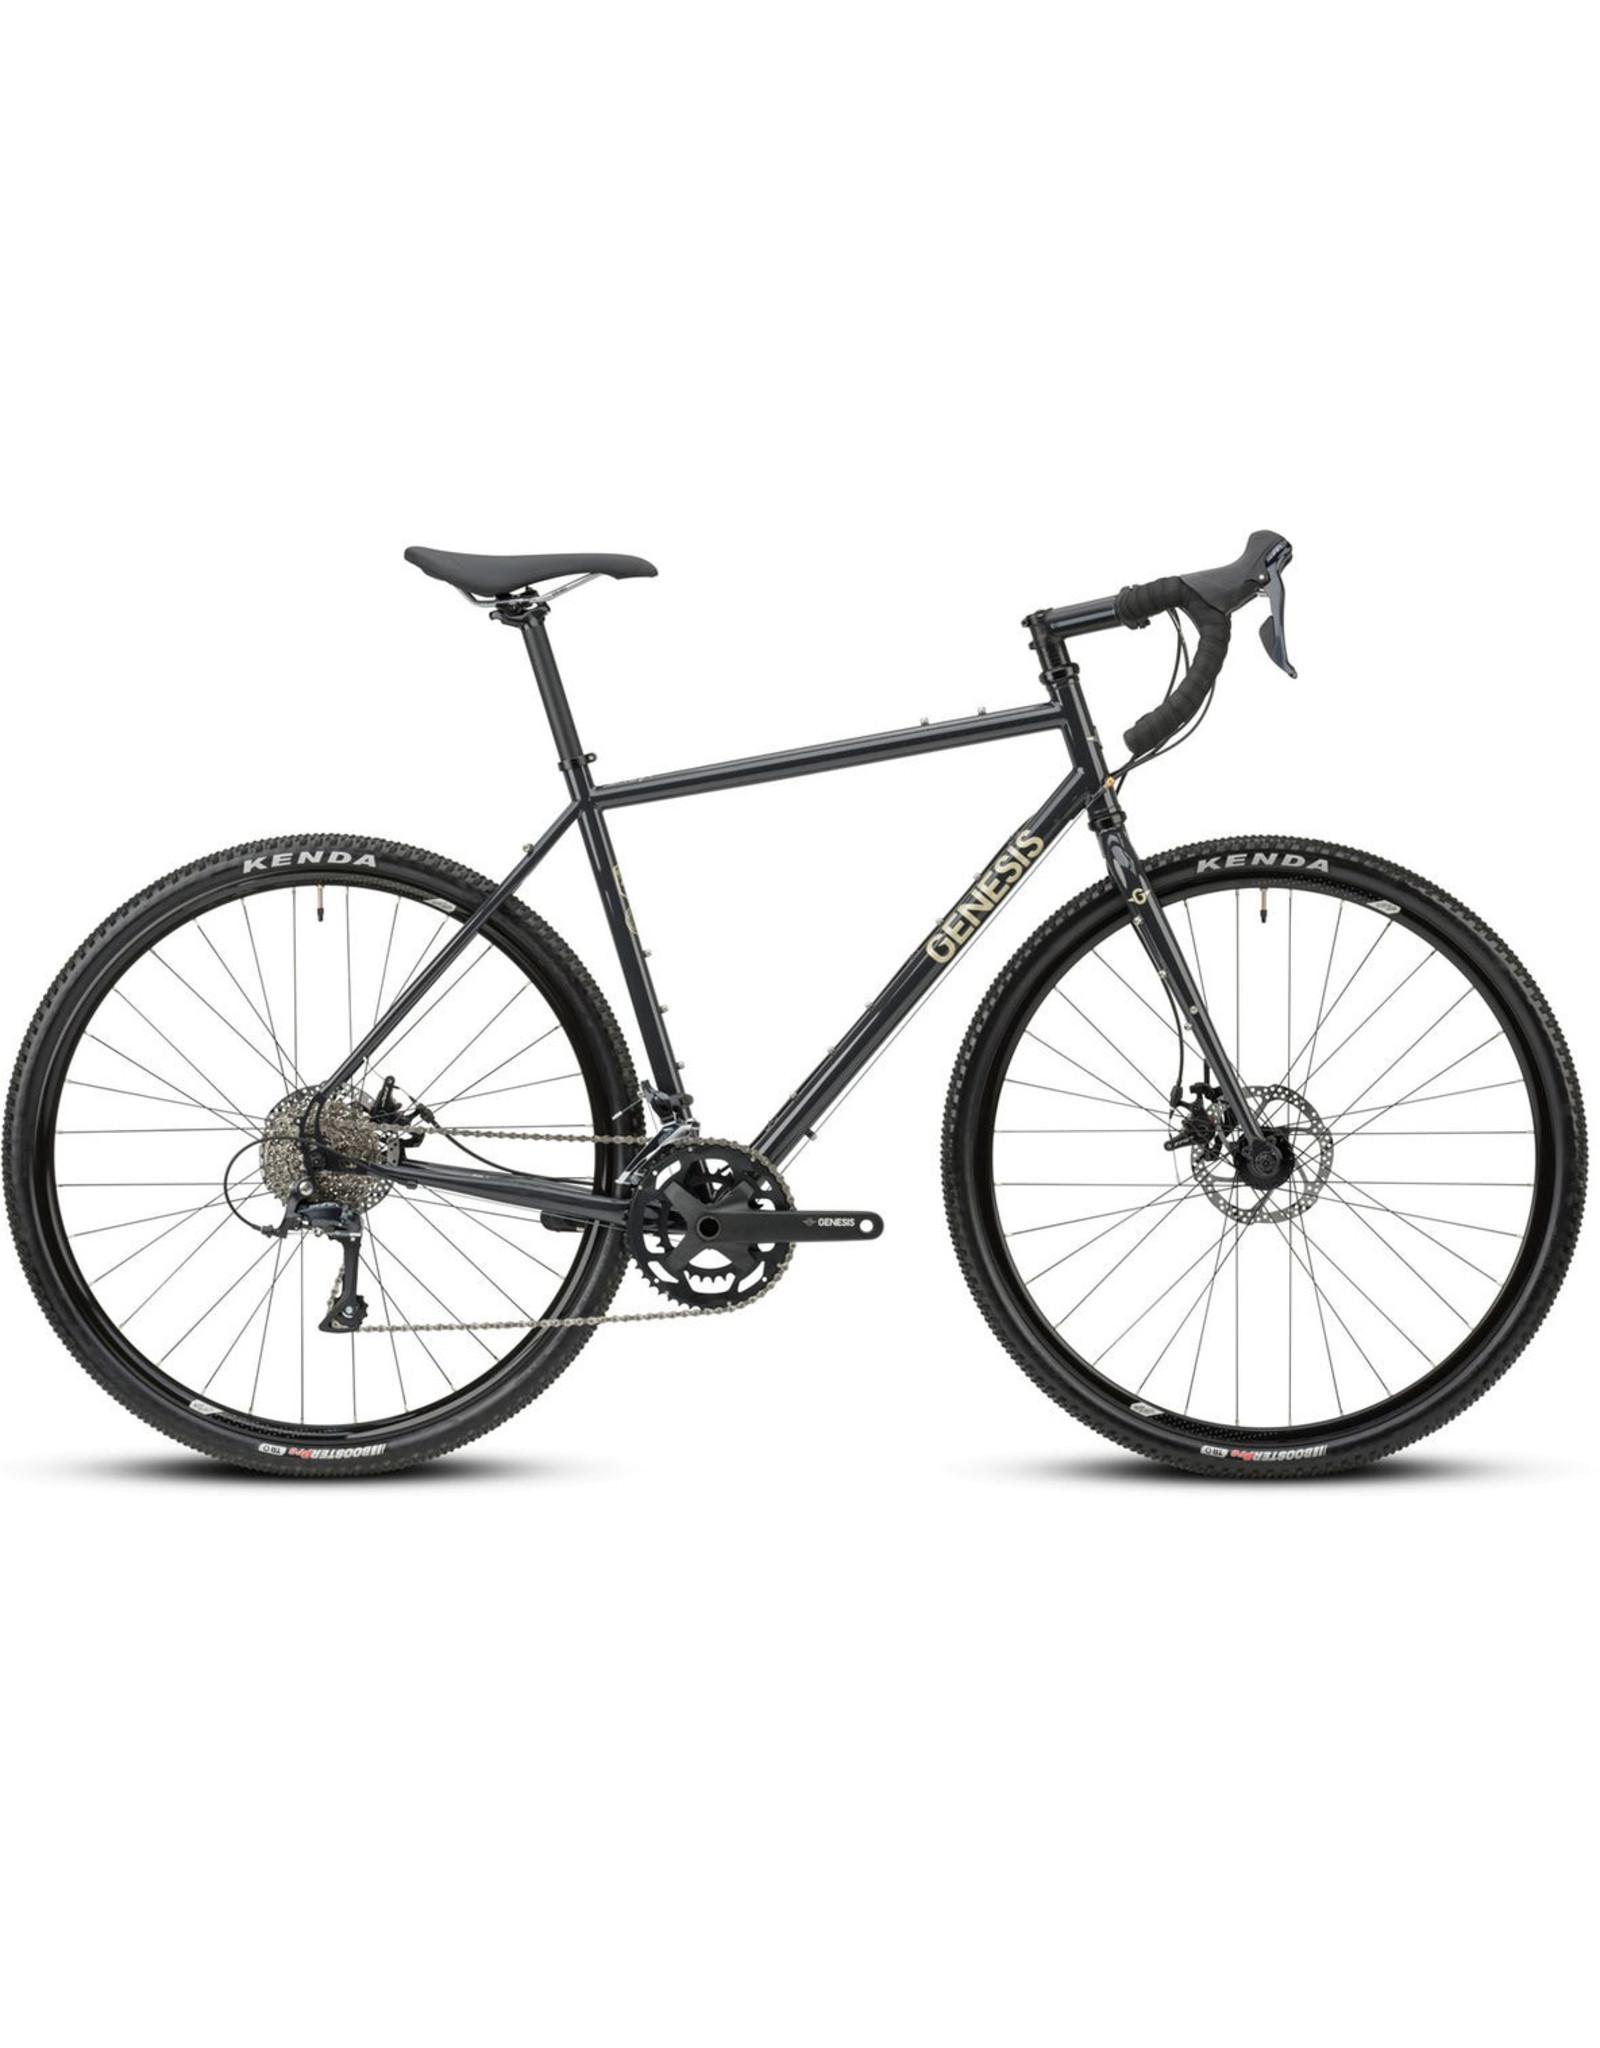 Genesis Croix De Fer 10 Adventure Bike 2021